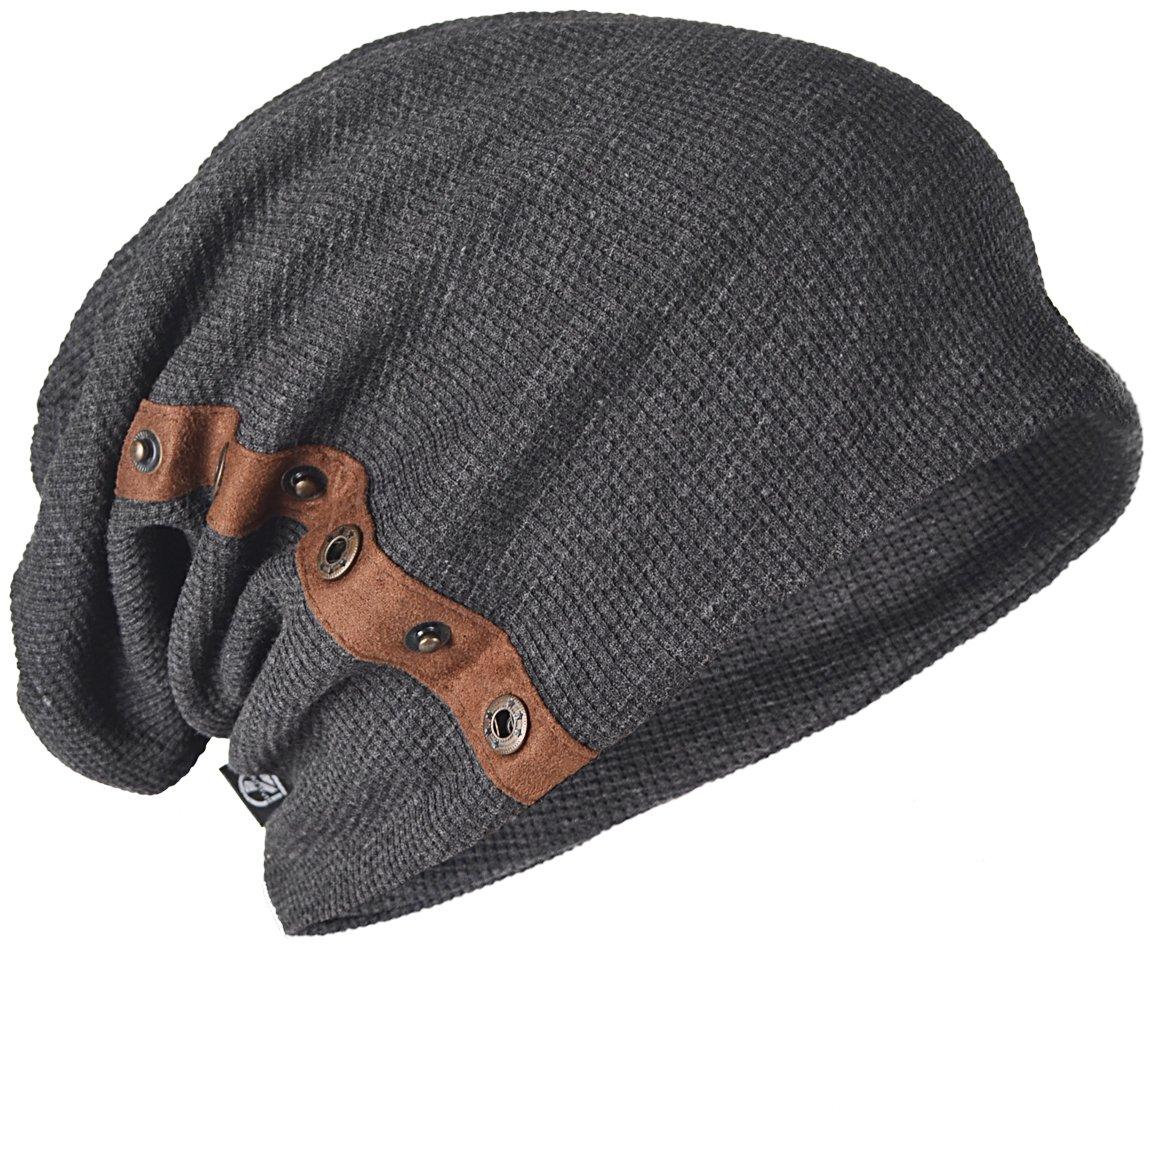 7fd18728937fe Stylish Men Women Slouch Beanie Basic Skull Cap Designer B010  (B305-Greyish) at Amazon Men s Clothing store